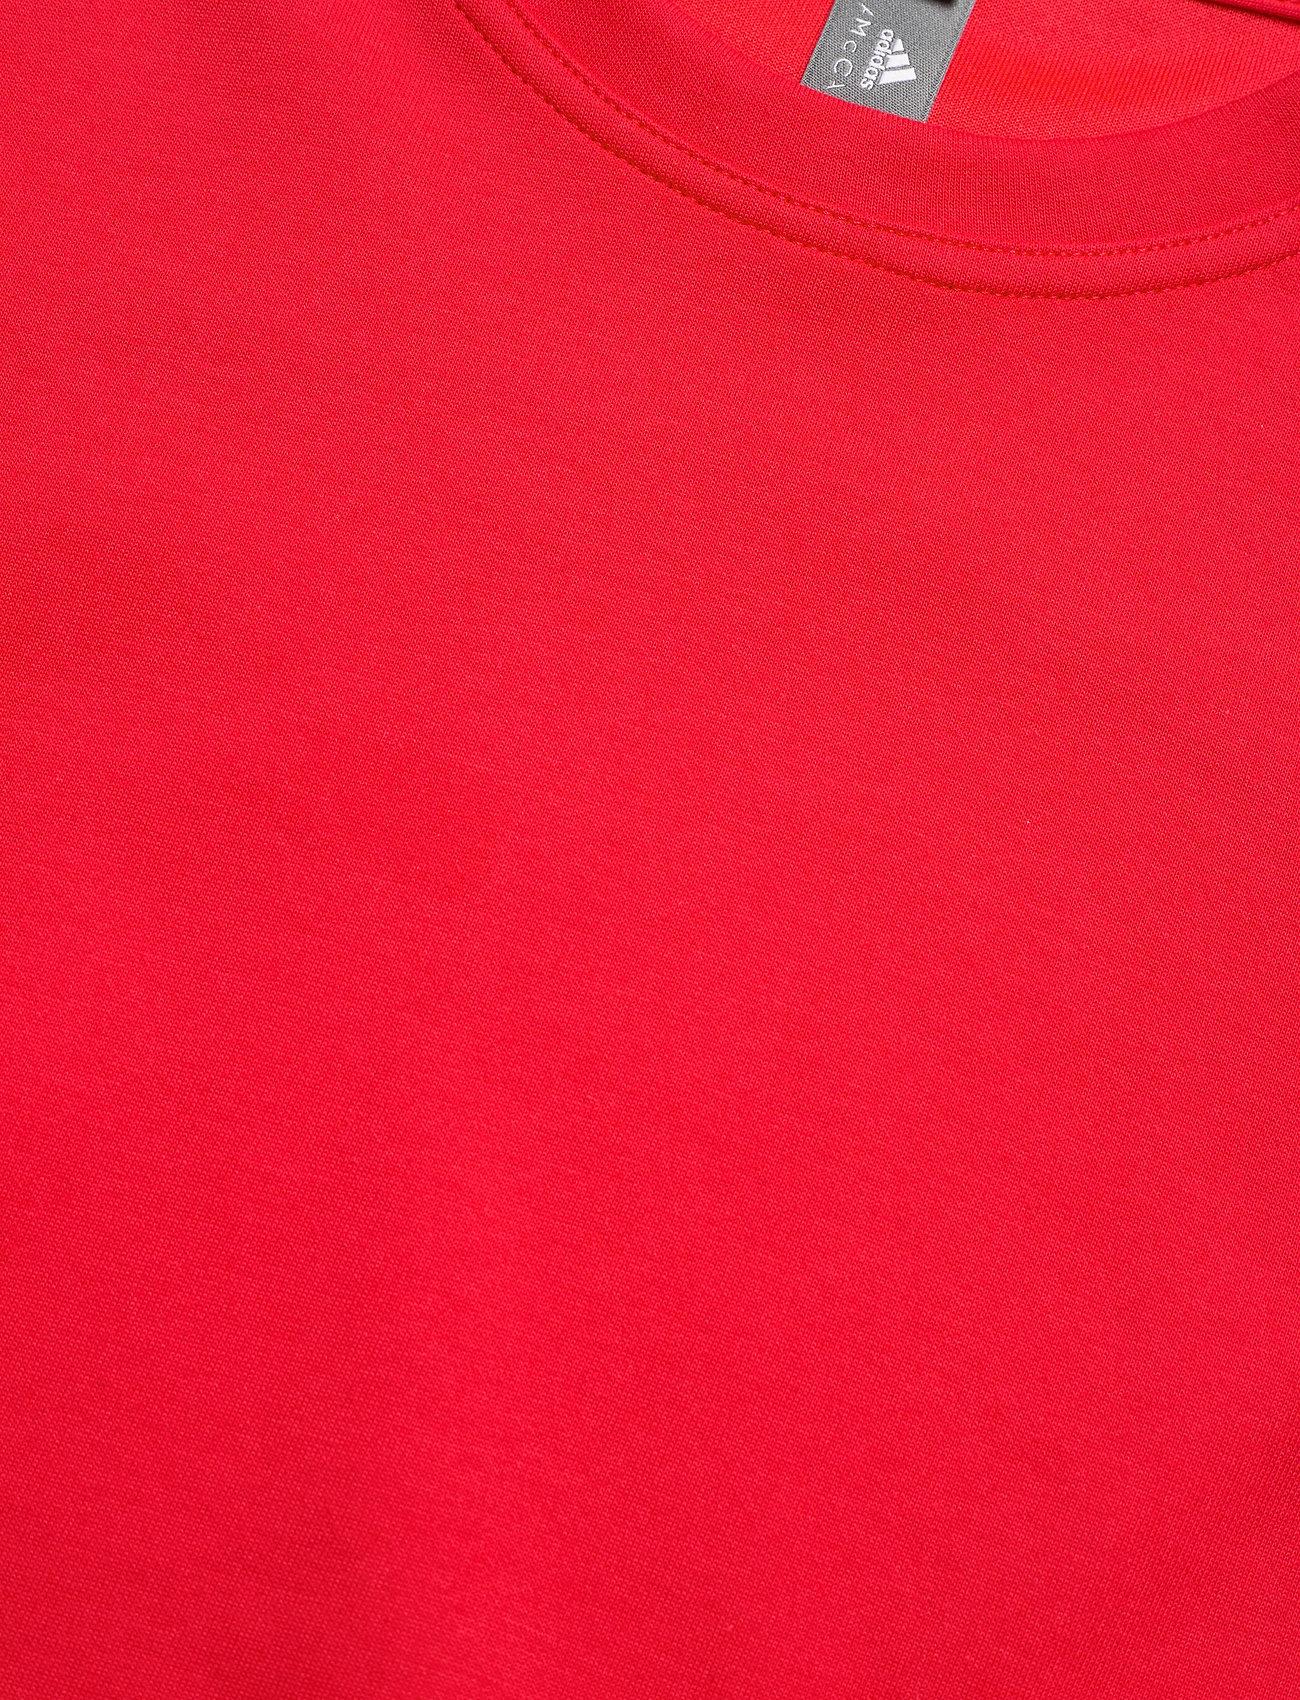 adidas by Stella McCartney - Future Playground Cropped T-Shirt W - tops & t-shirts - vivred - 4